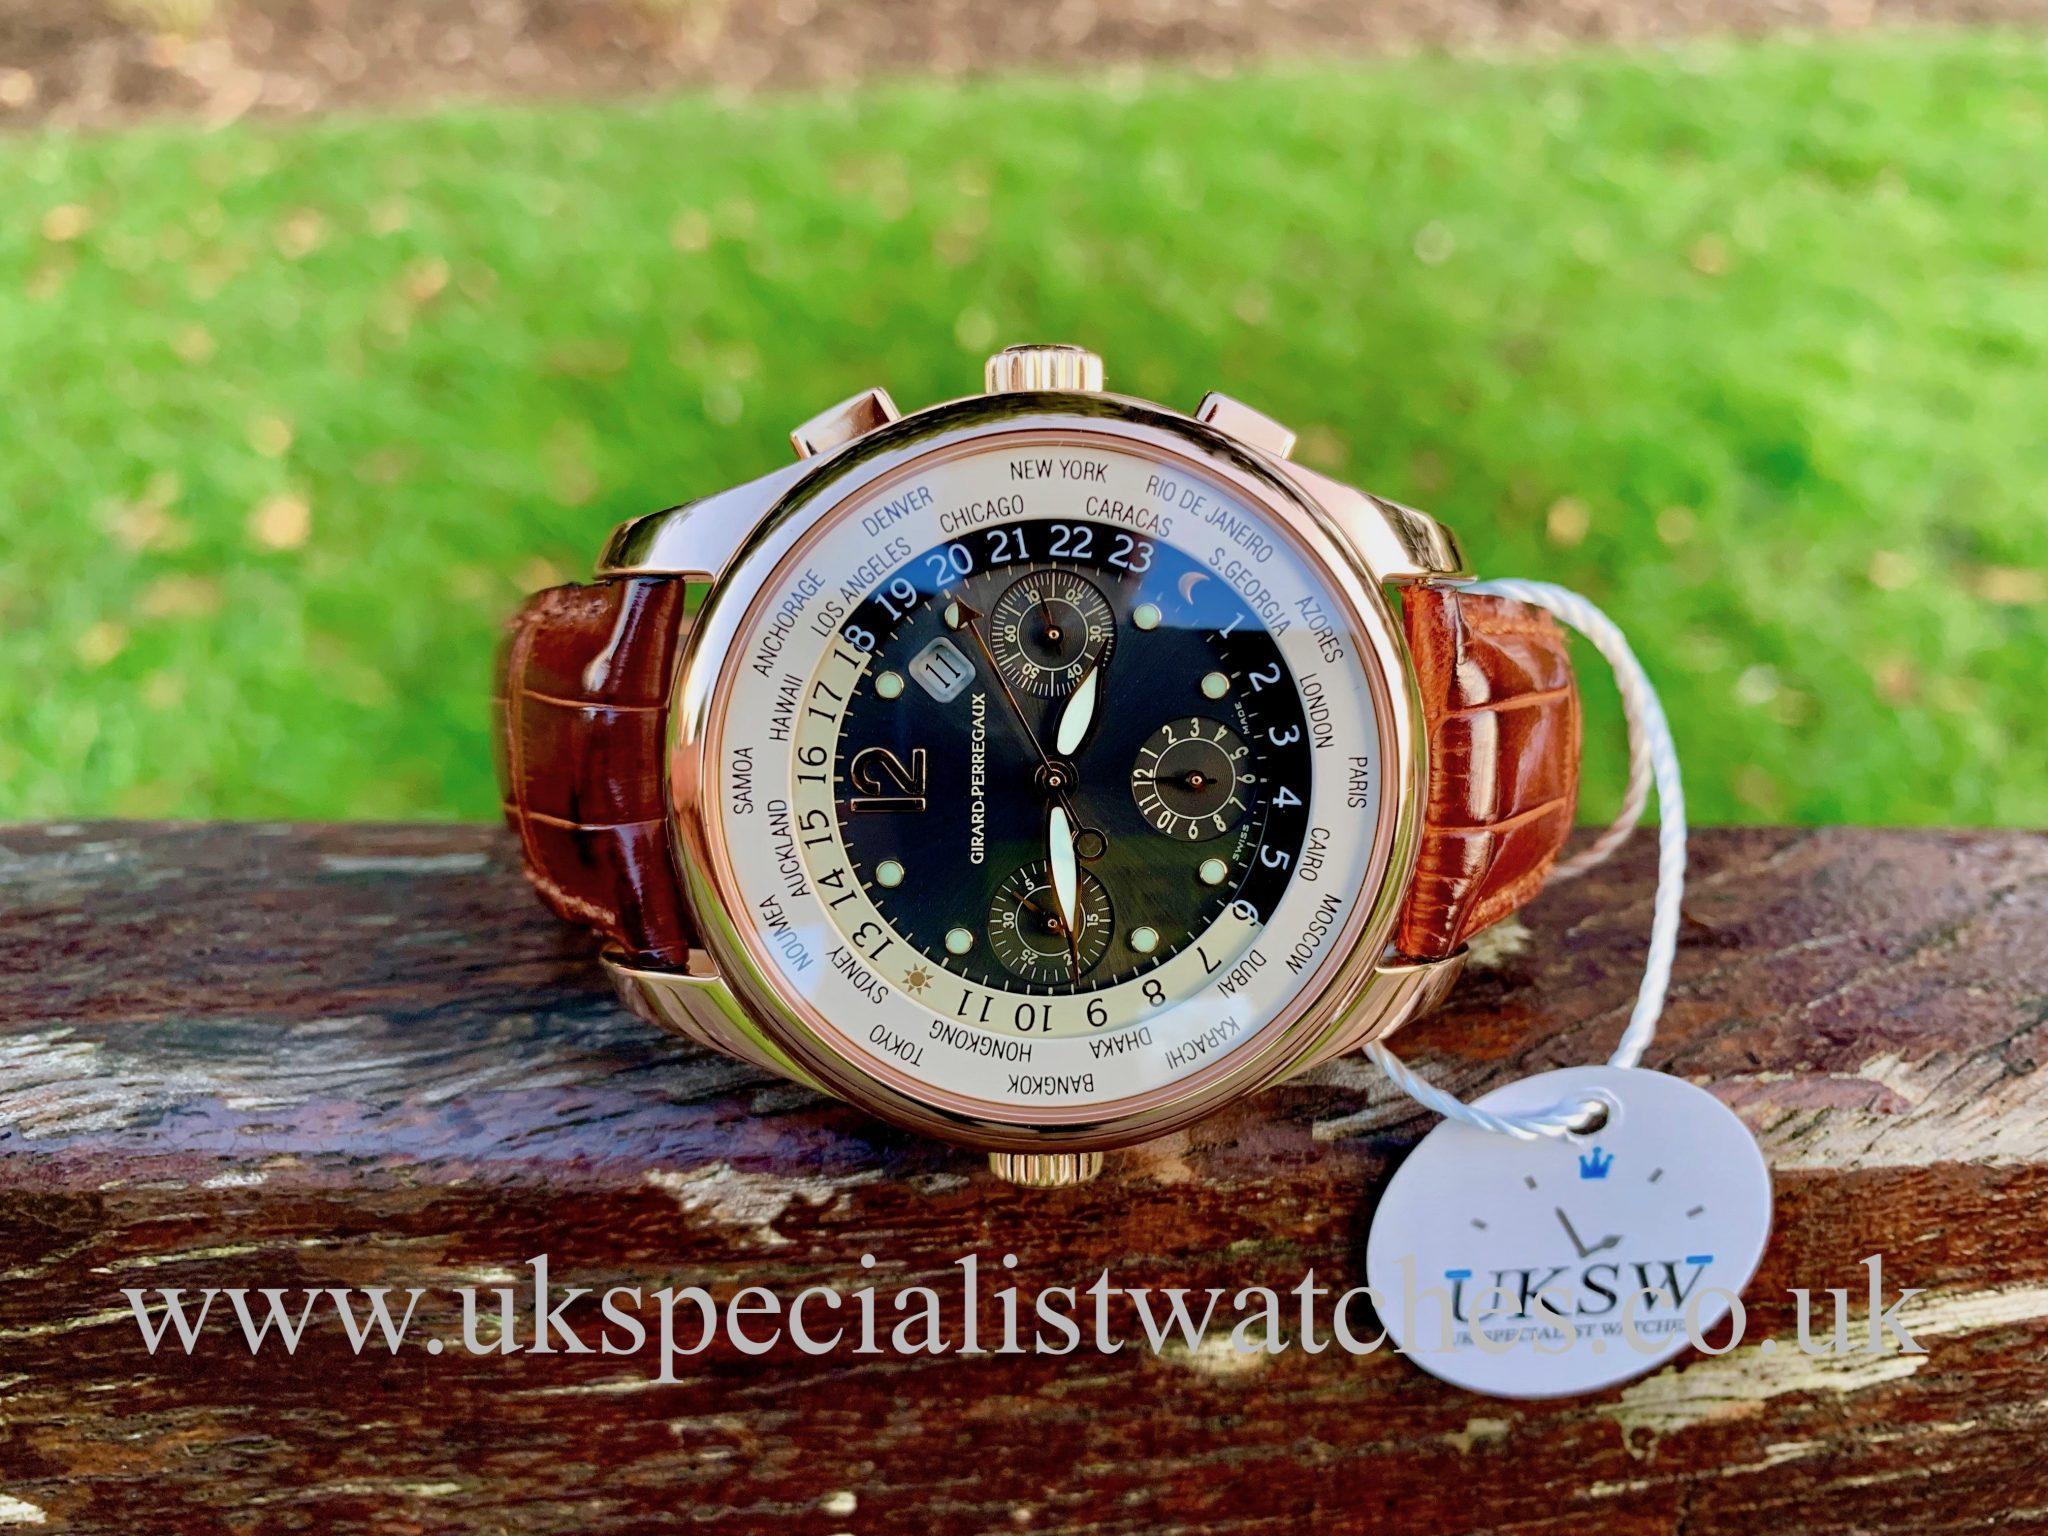 Girard Perregaux WW.TC World Time Chronograph - 18ct Rose Gold - 49800